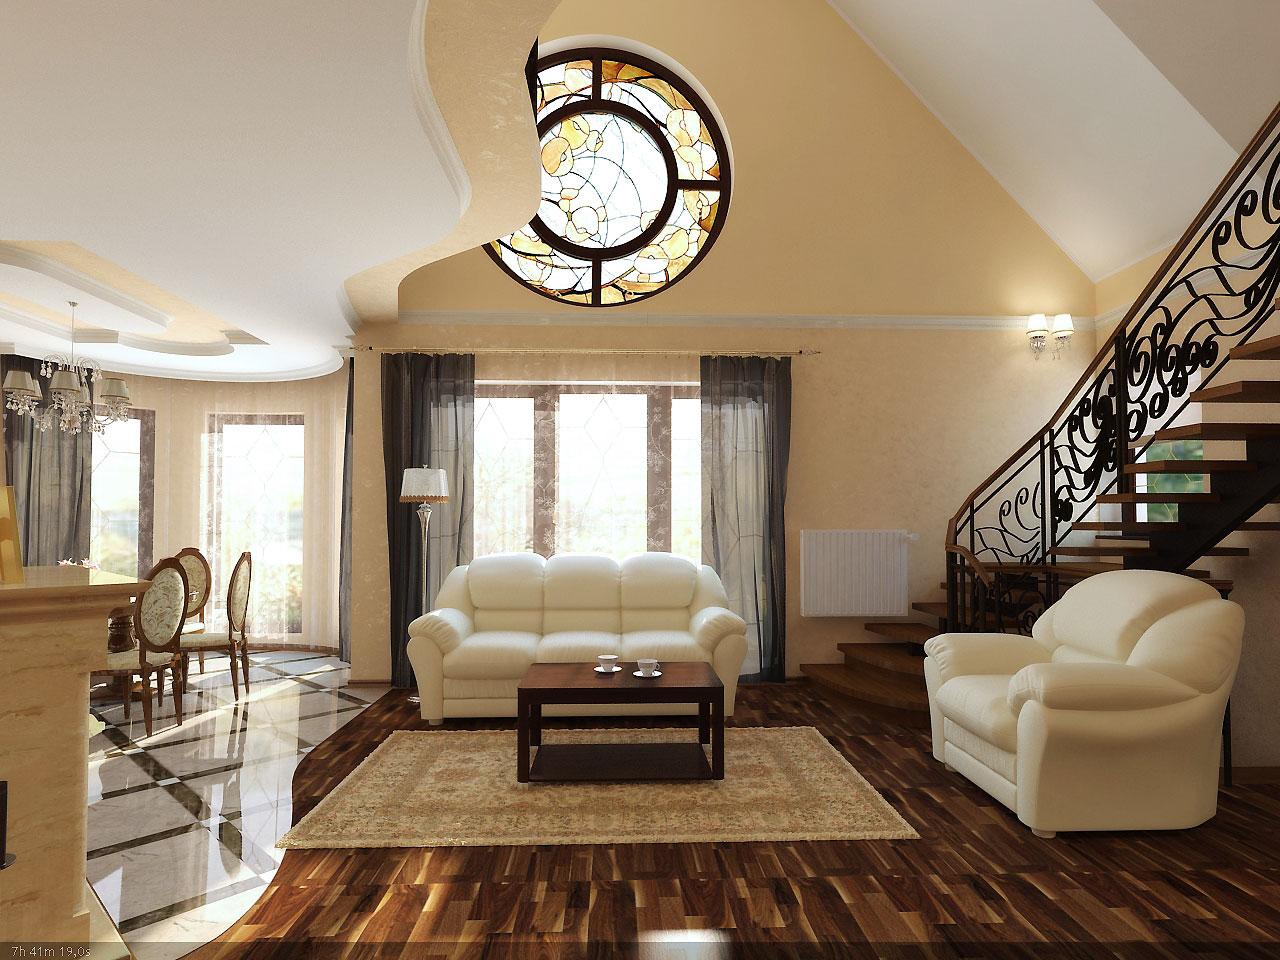 Attractive Now, Letu0027s Explore Each One More In Depth. Interior Design